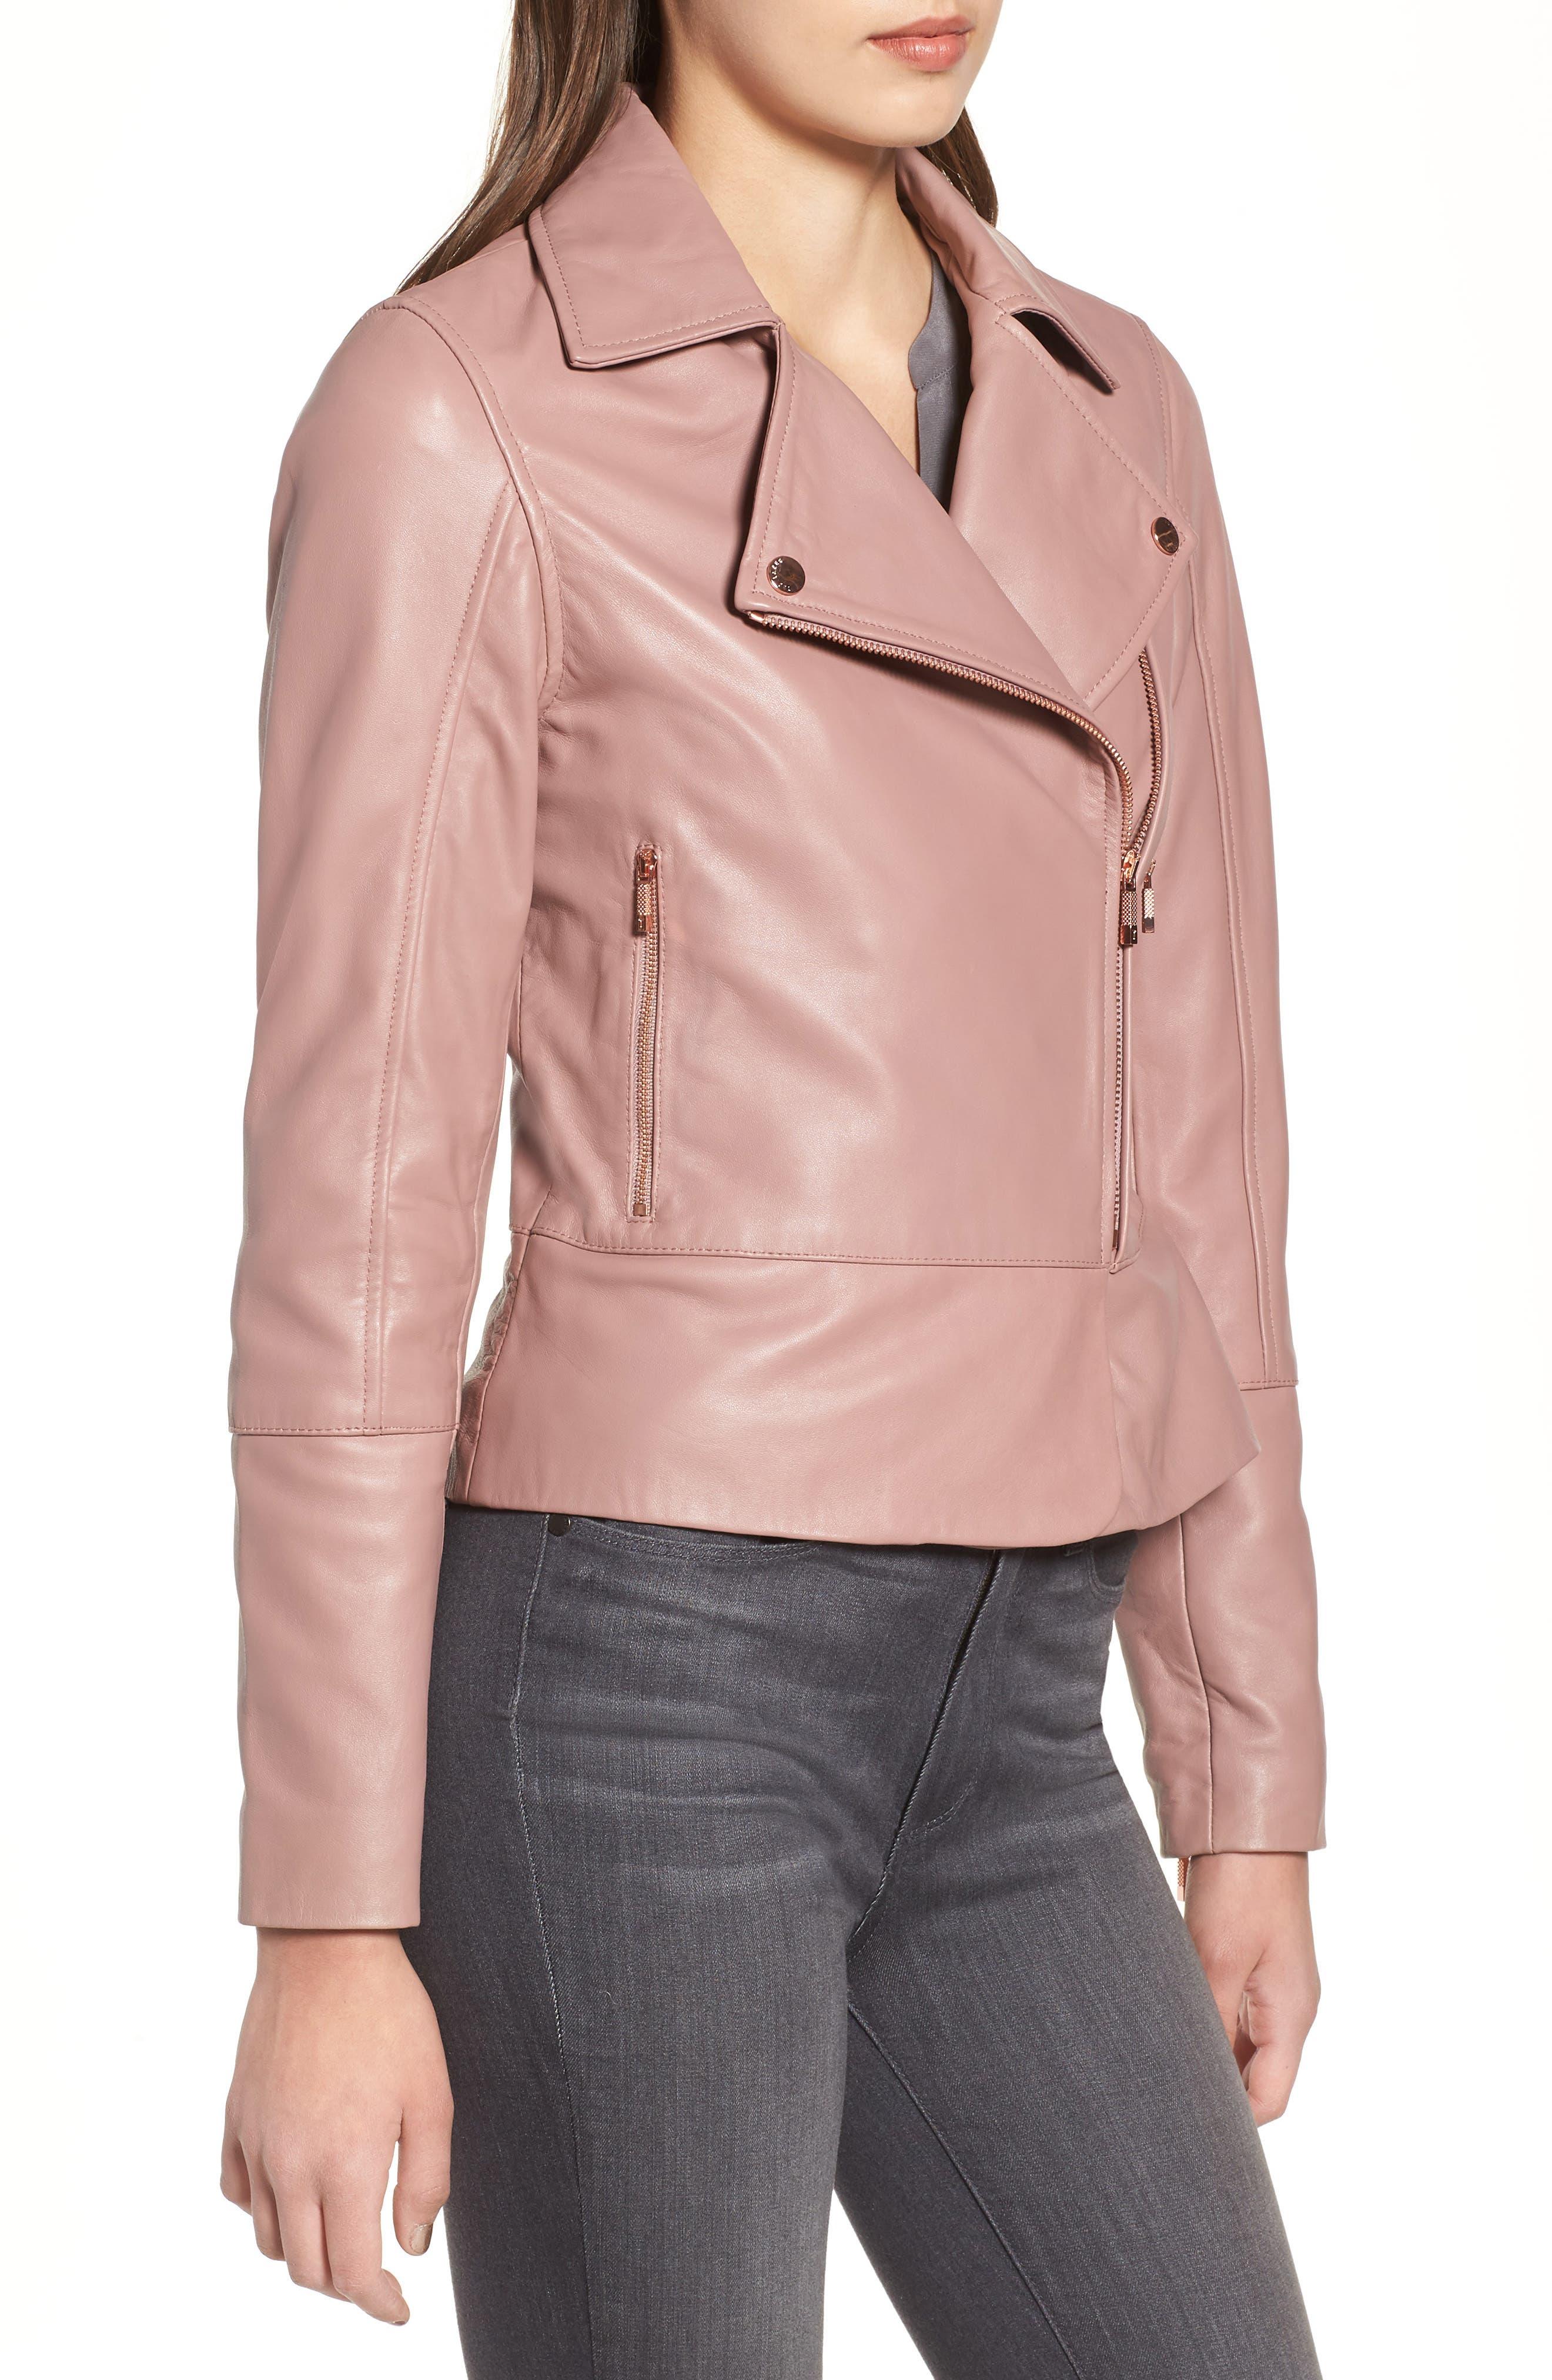 Lizia Leather Biker Jacket,                             Alternate thumbnail 3, color,                             Dusky Pink